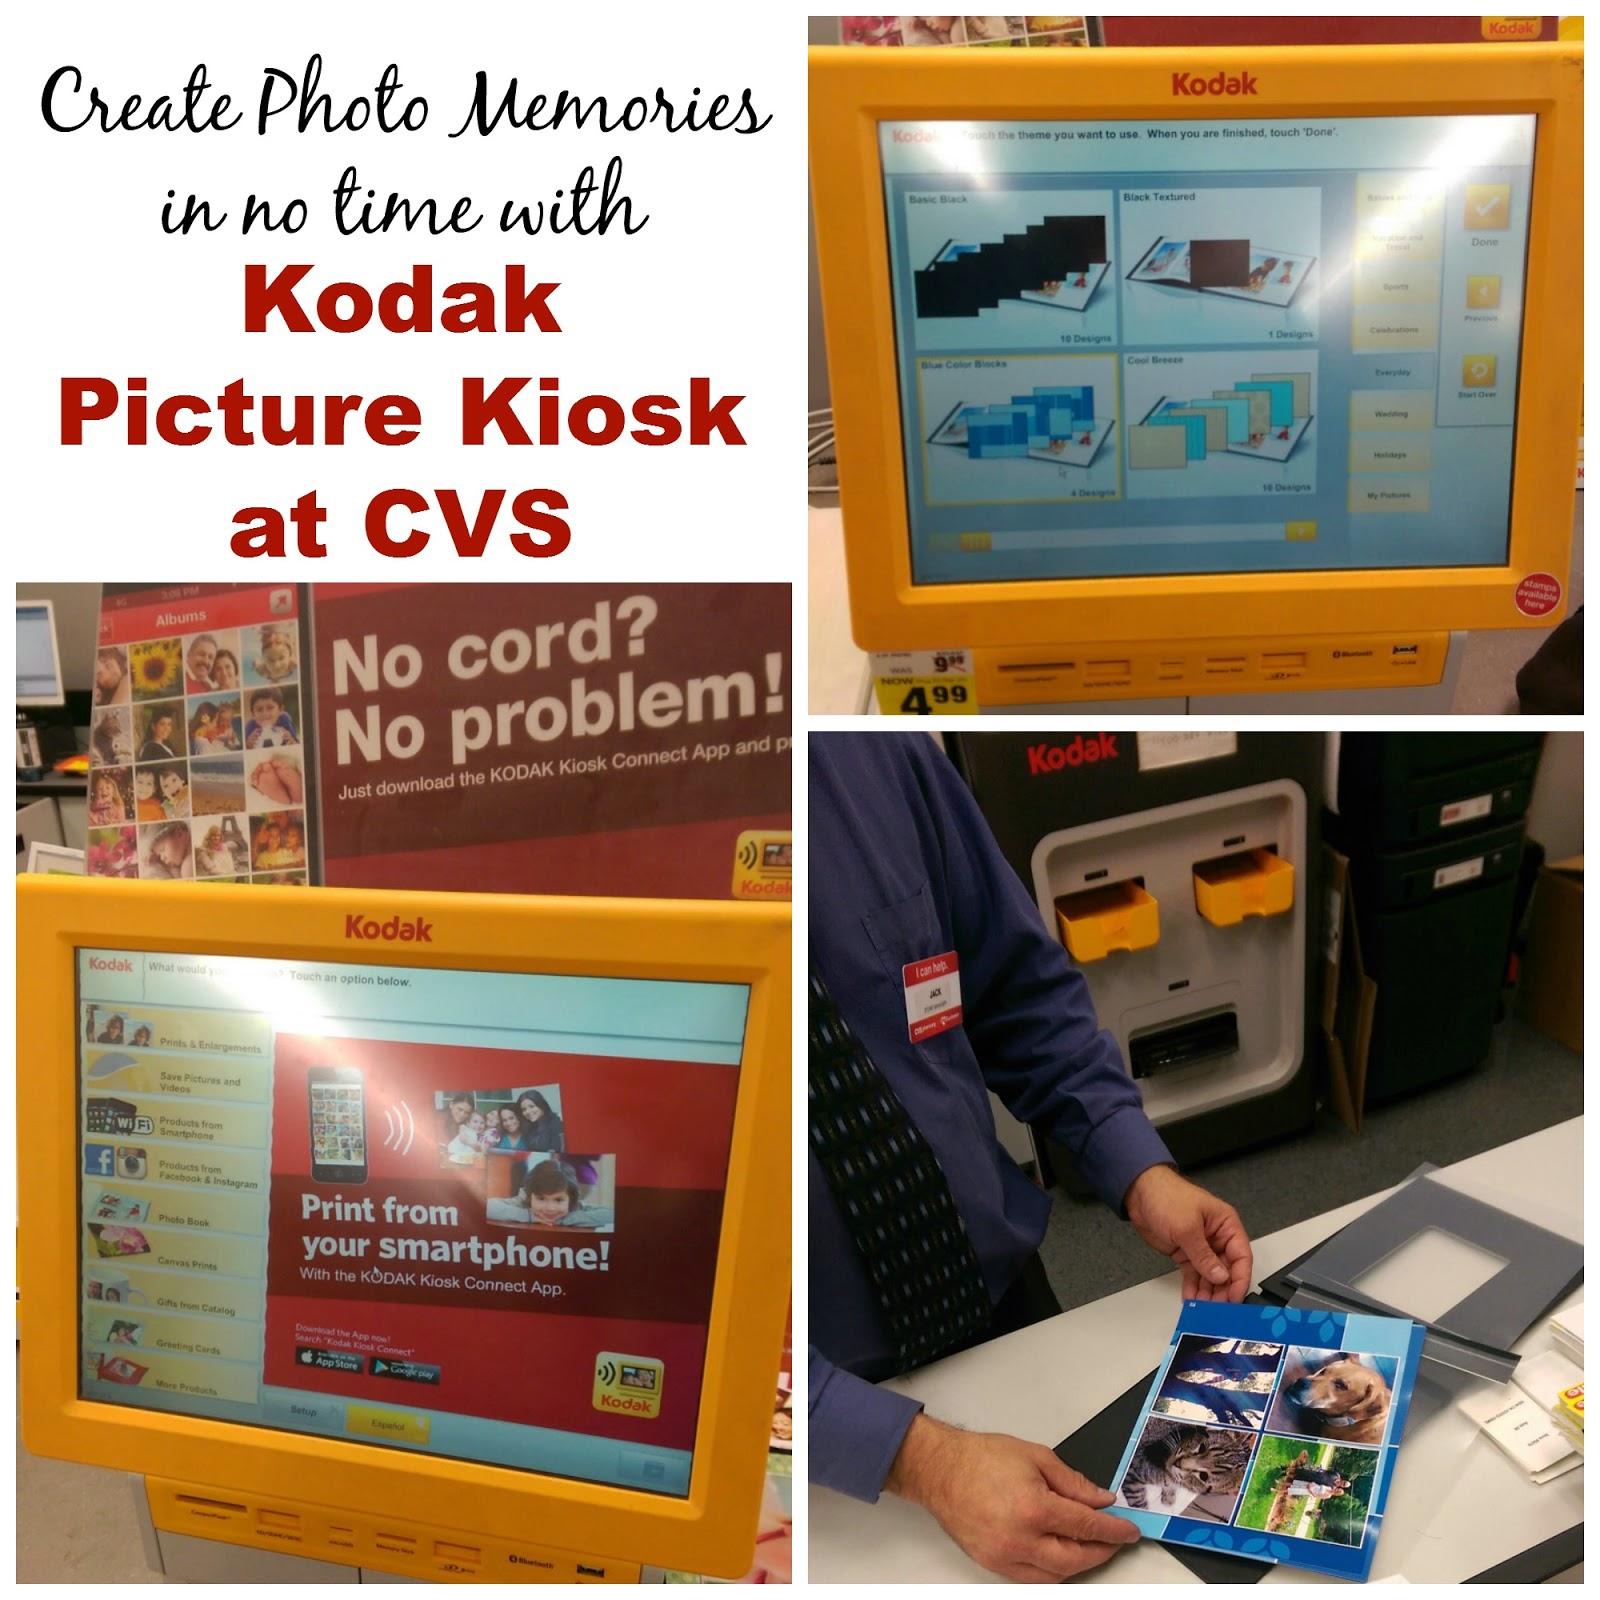 Kodak Kiosk Locations Near Me